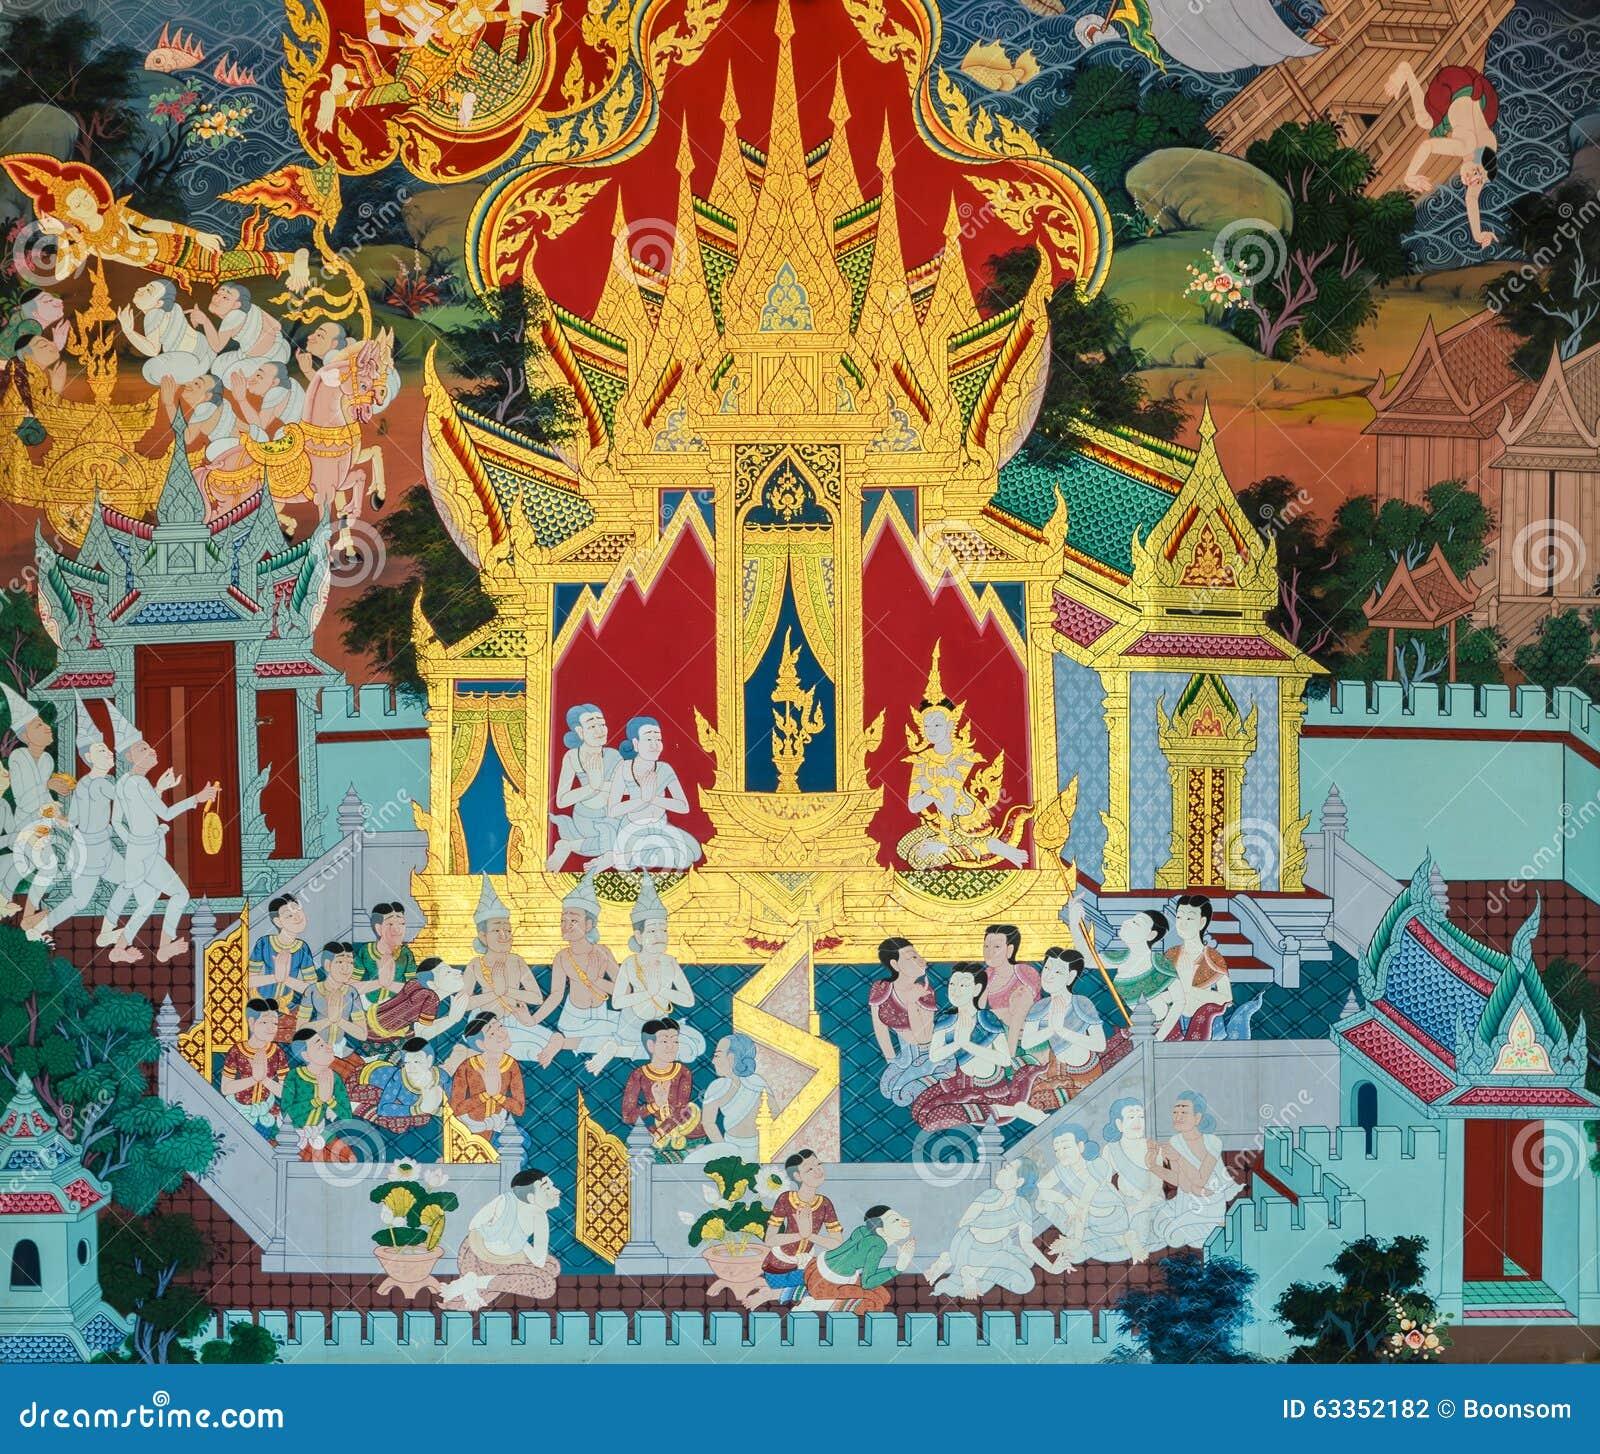 Thai mural painting art stock photo image of life for Buddha mural art